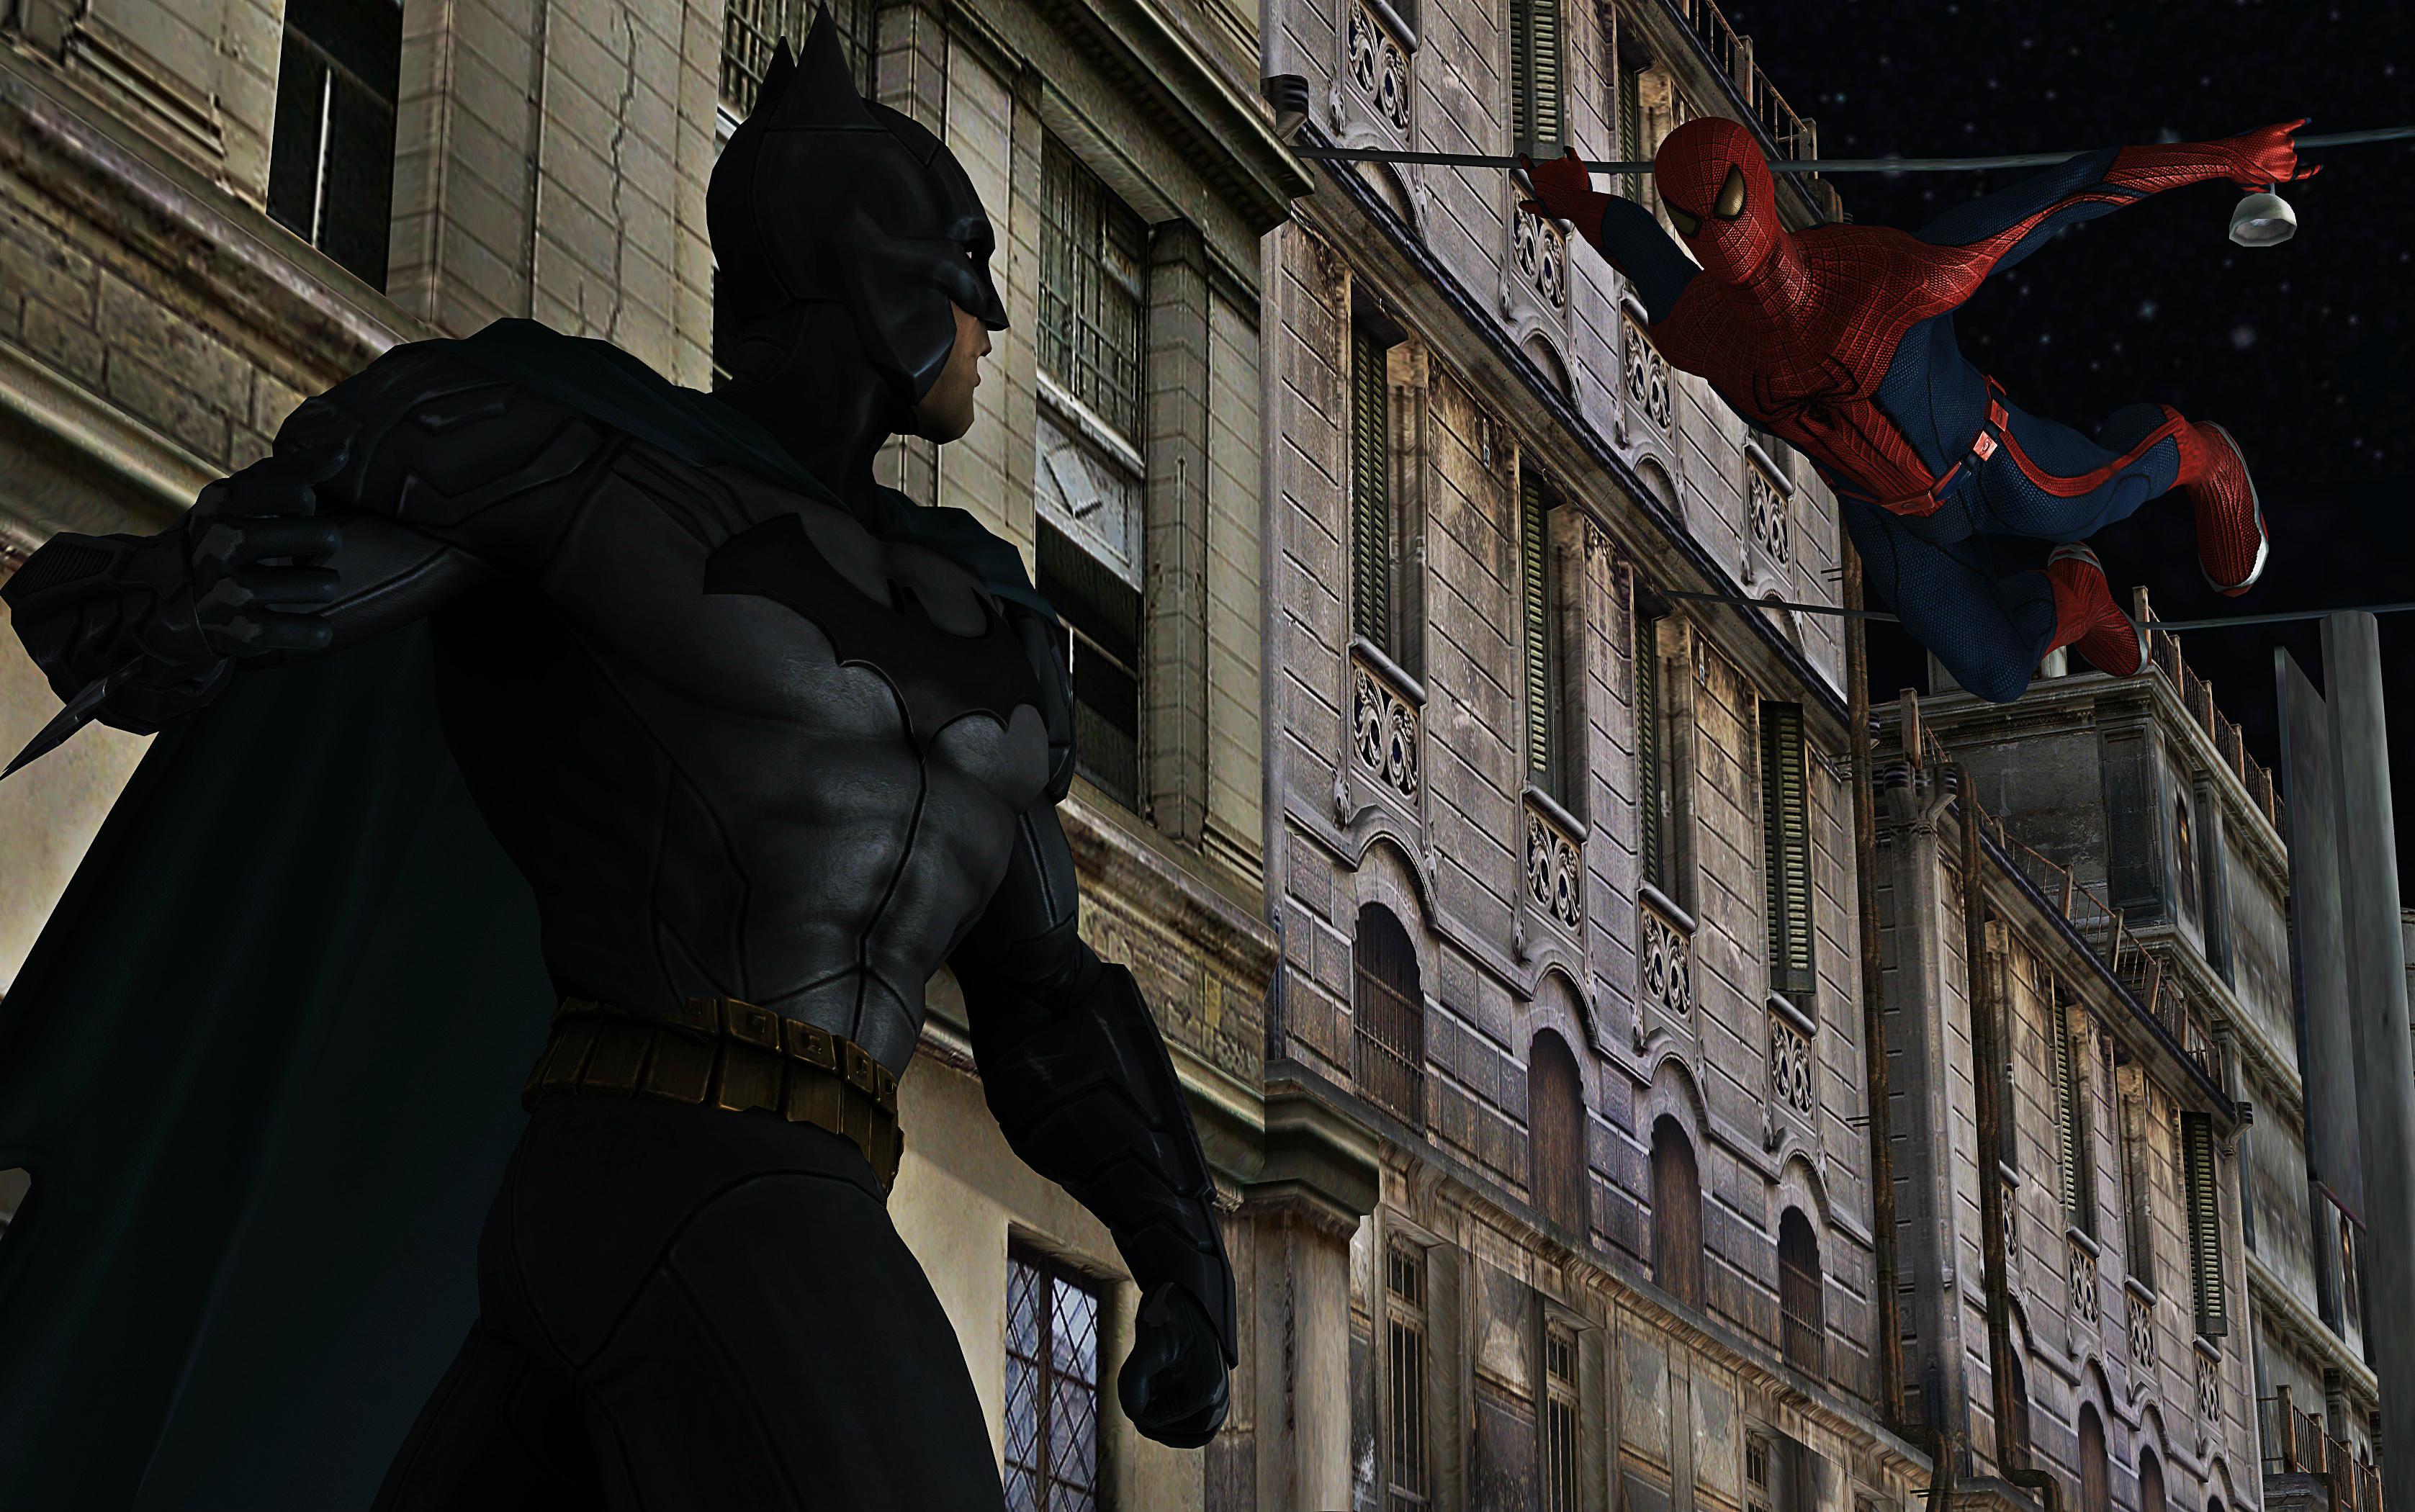 Batman Vs. Spider-Man by calibur222 on DeviantArt